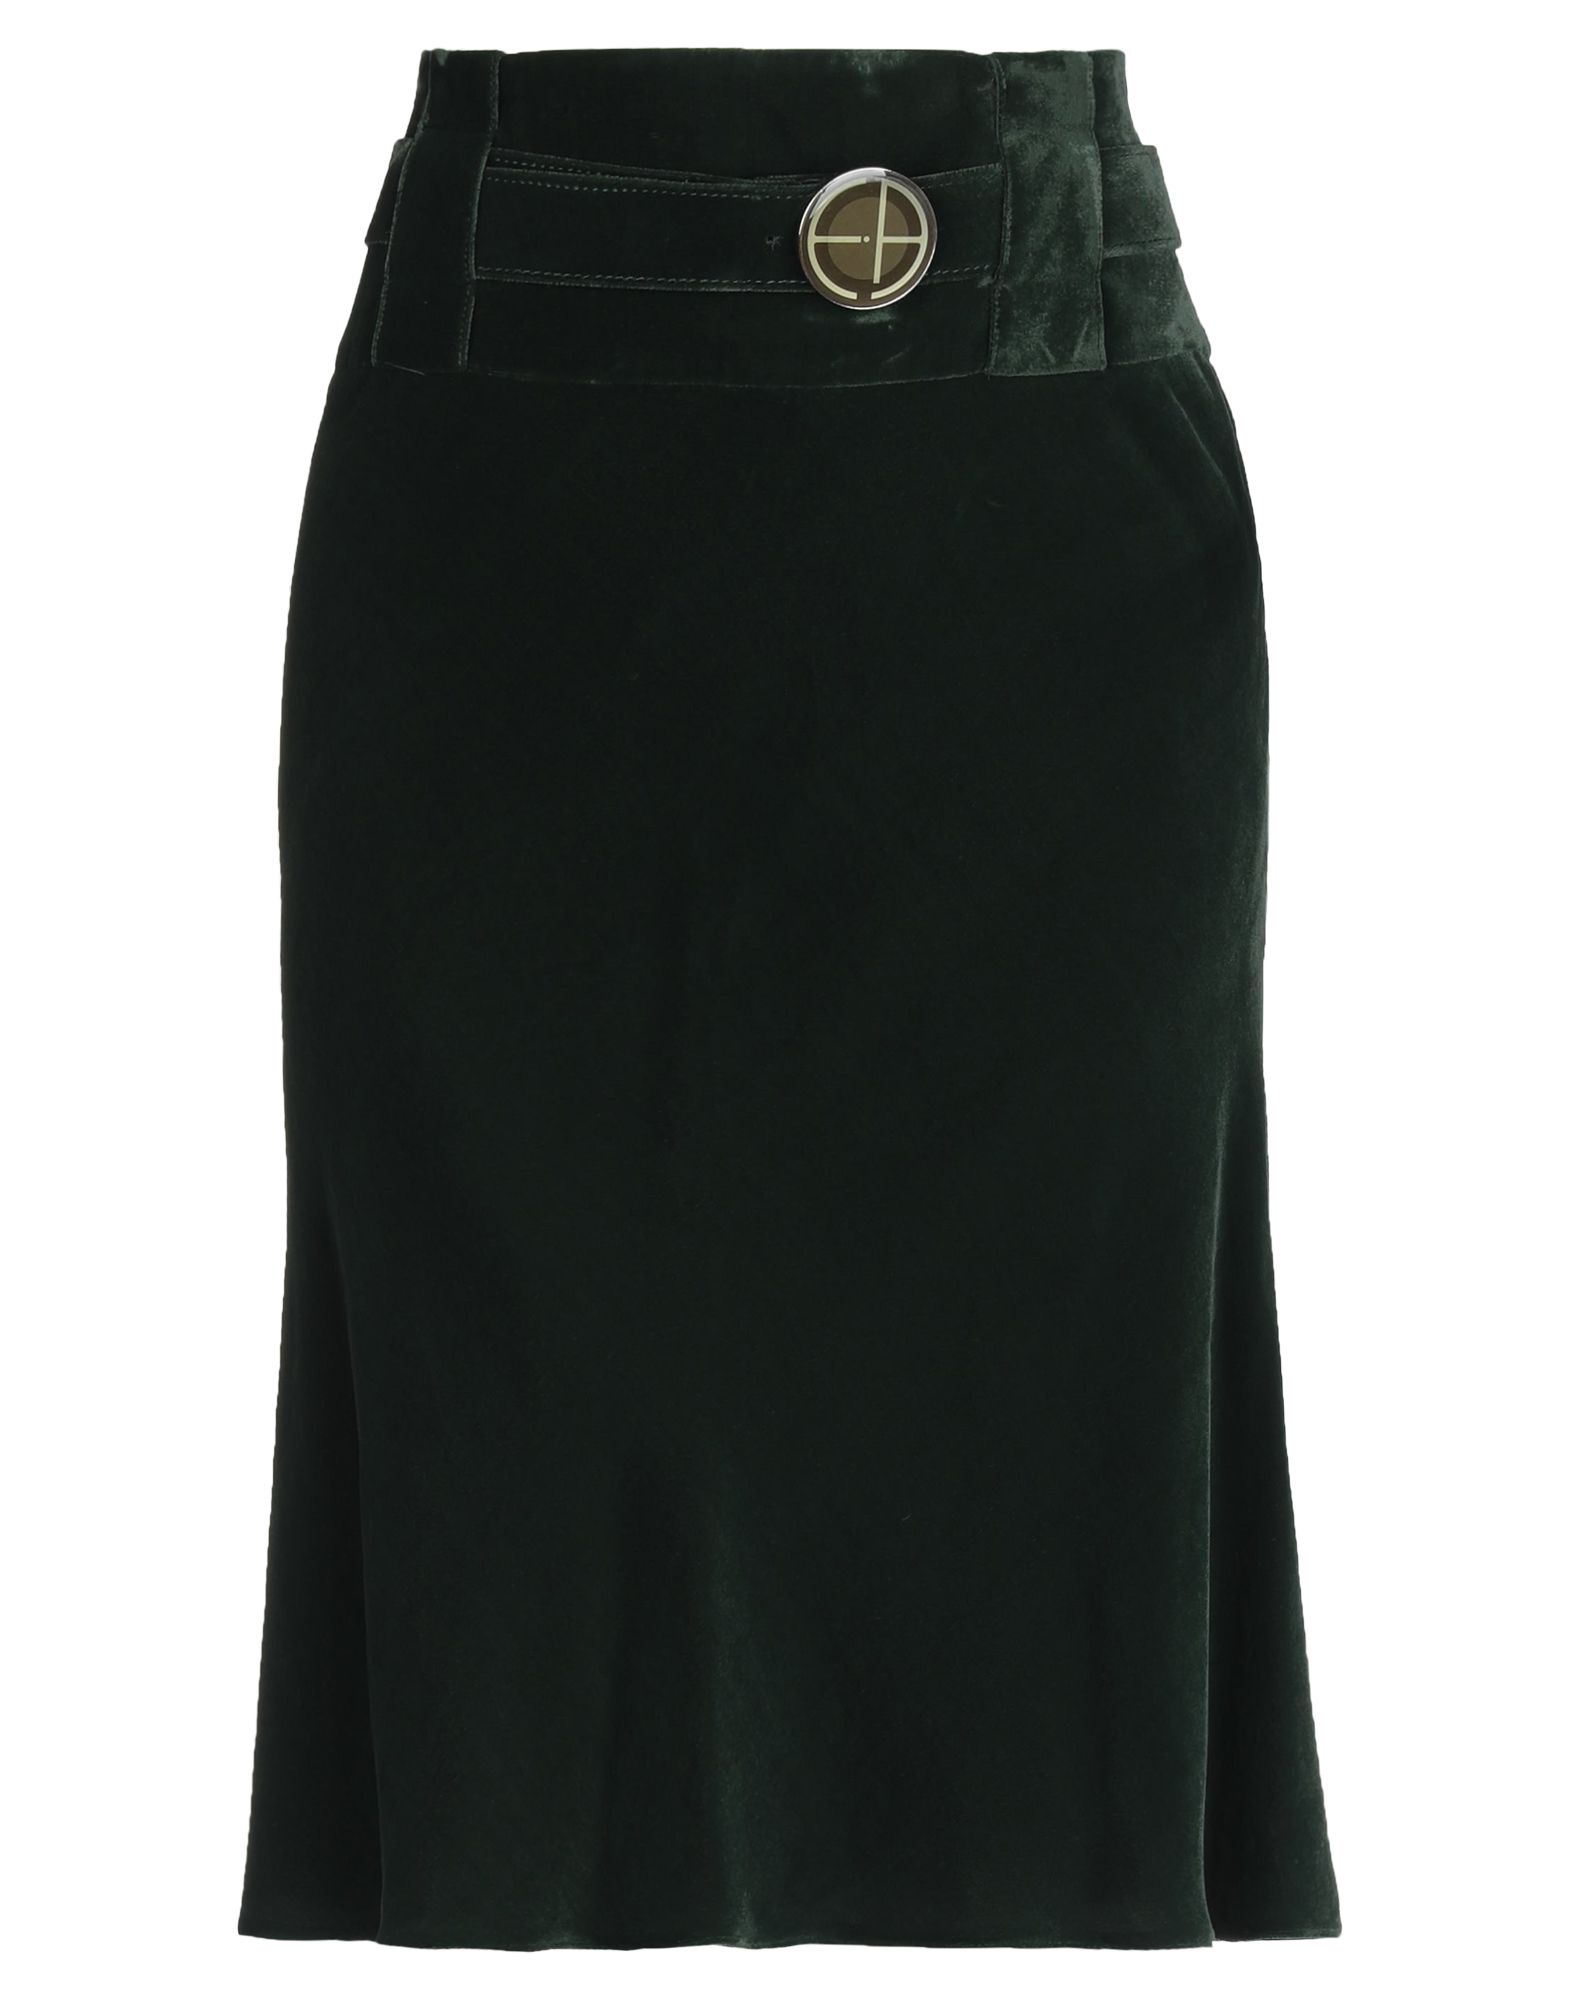 EMPORIO ARMANI Юбка длиной 3/4 emporio armani платье длиной 3 4